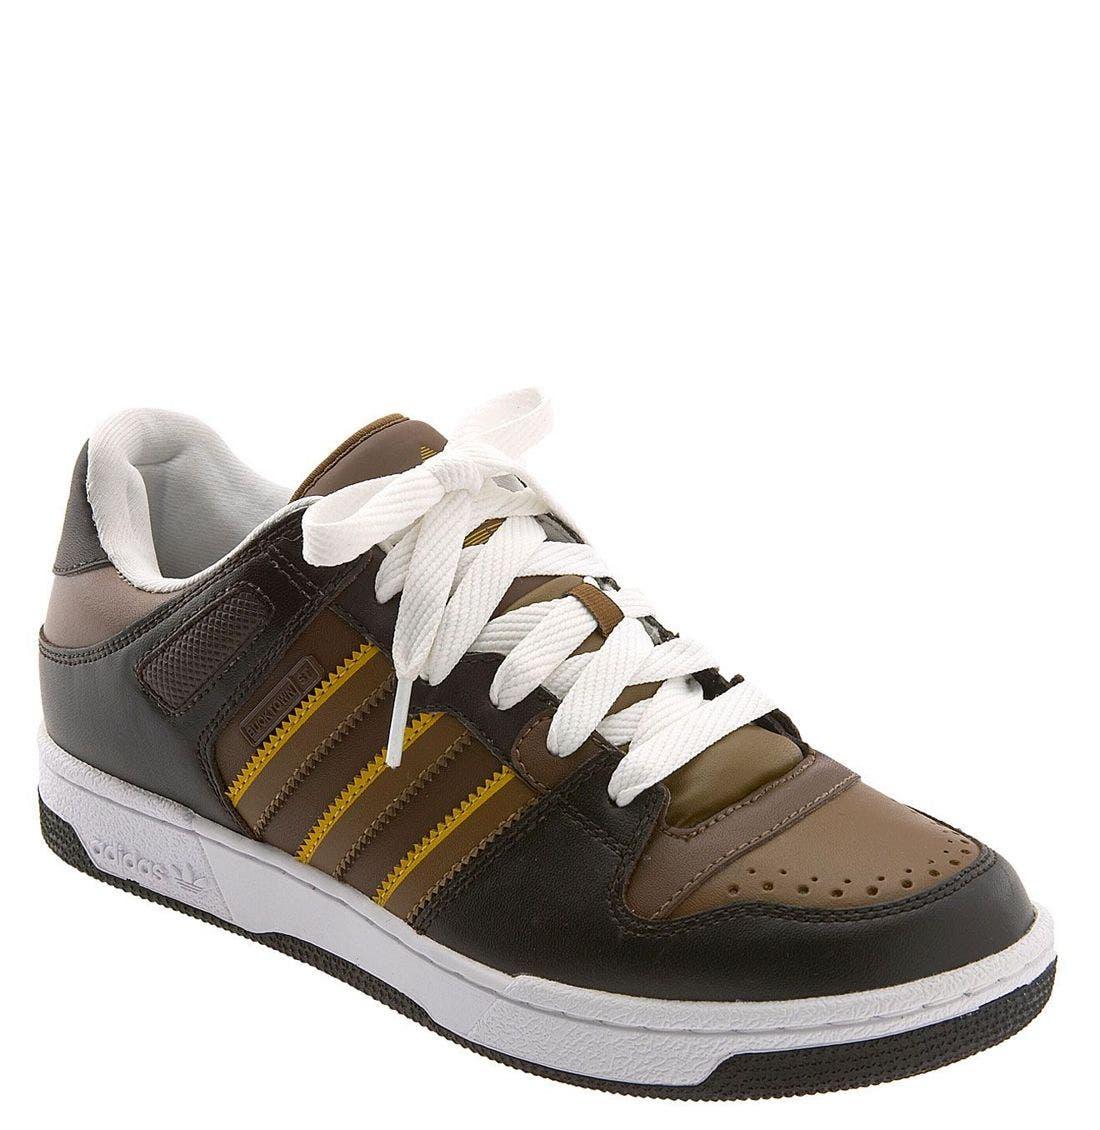 'Bucktown ST' Athletic Shoe, Main, color, QLG